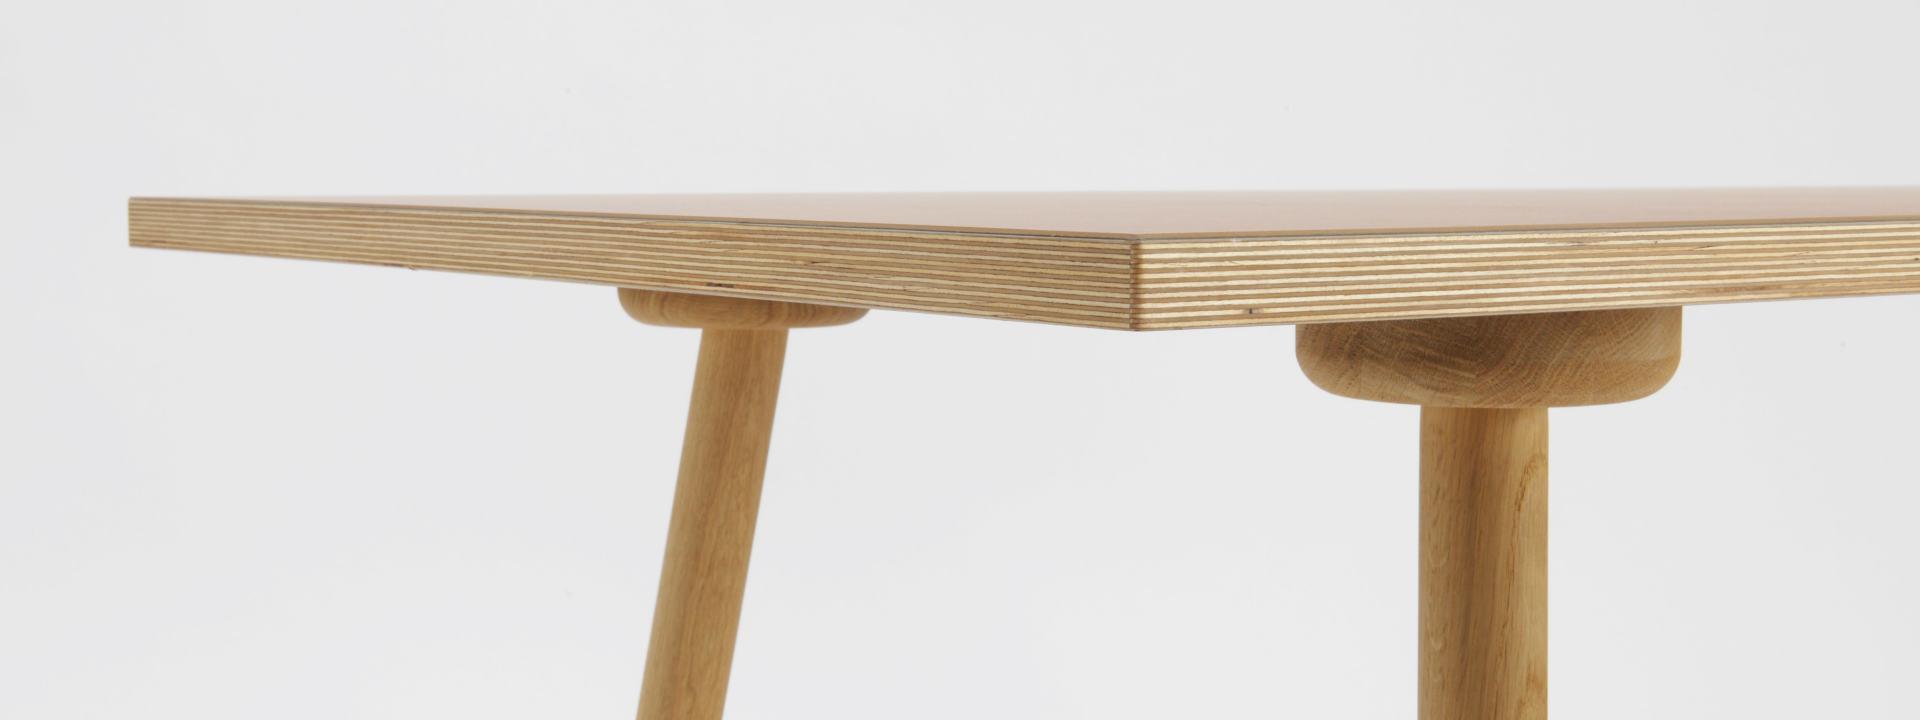 basic linoleum table top by faust linoleum tabletops faust linoleum lino table top. Black Bedroom Furniture Sets. Home Design Ideas